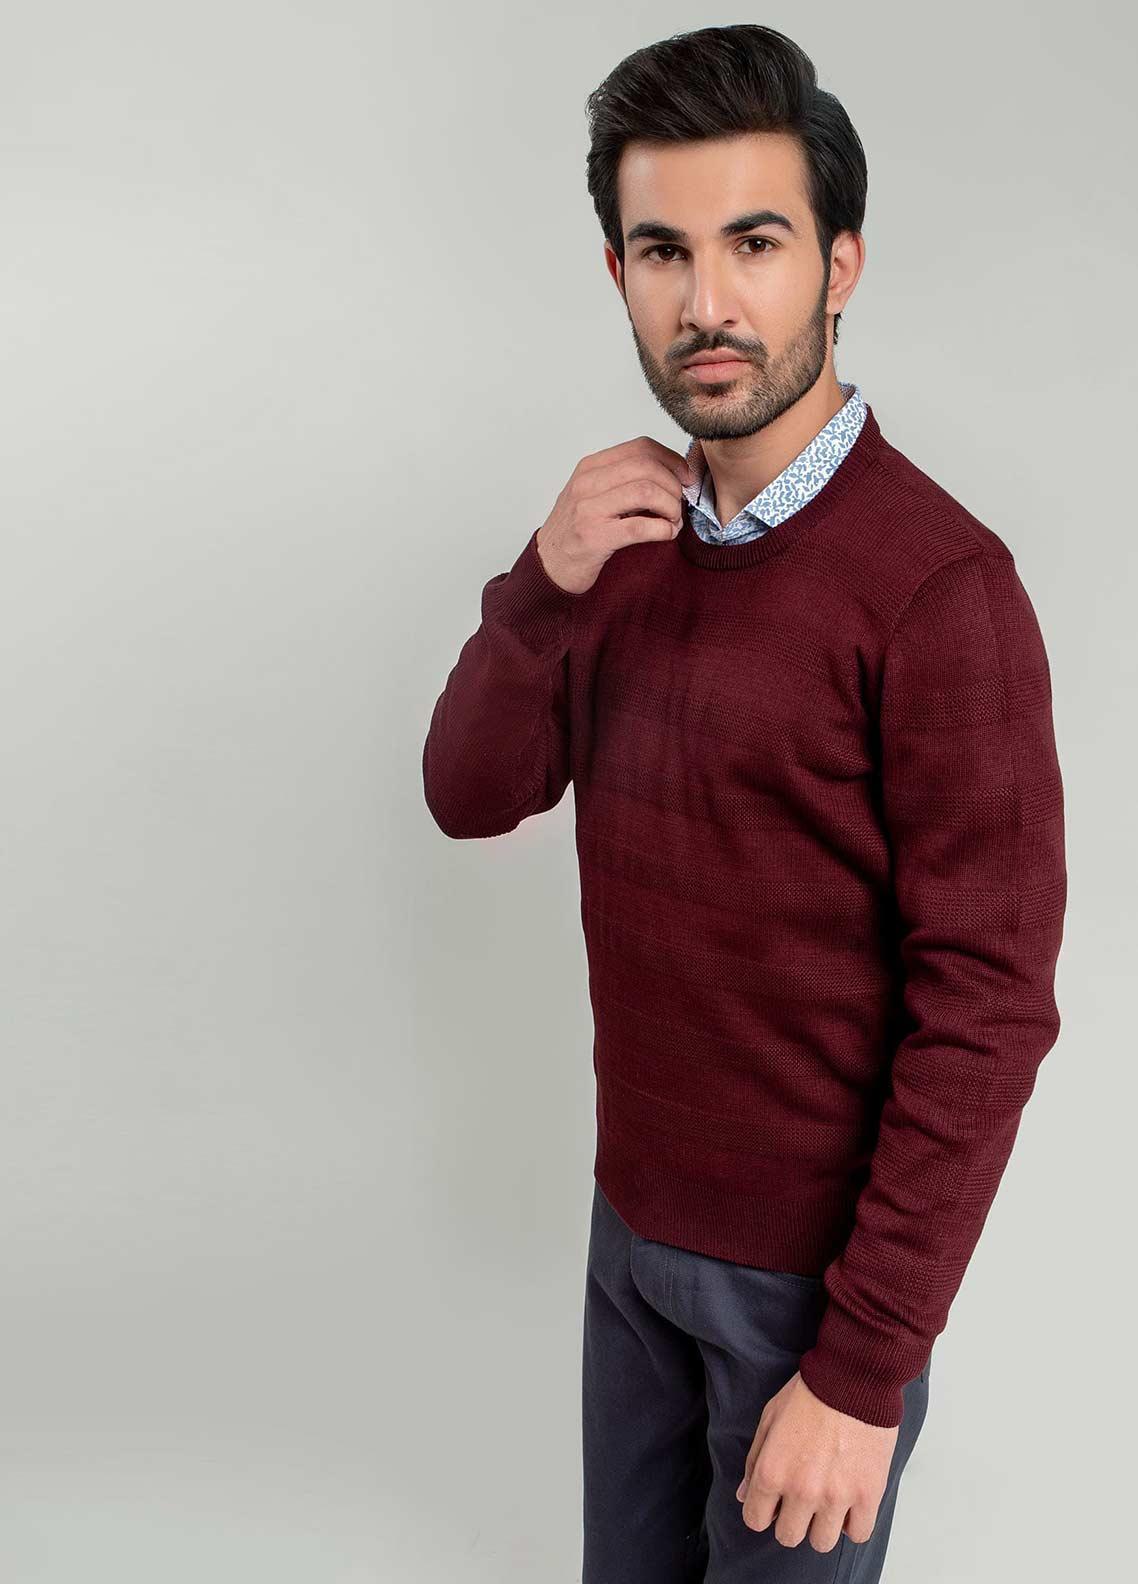 Brumano Cotton Full Sleeves Men Sweaters -  BM20WS Dark Maroon Textured Crew Neck Sweater